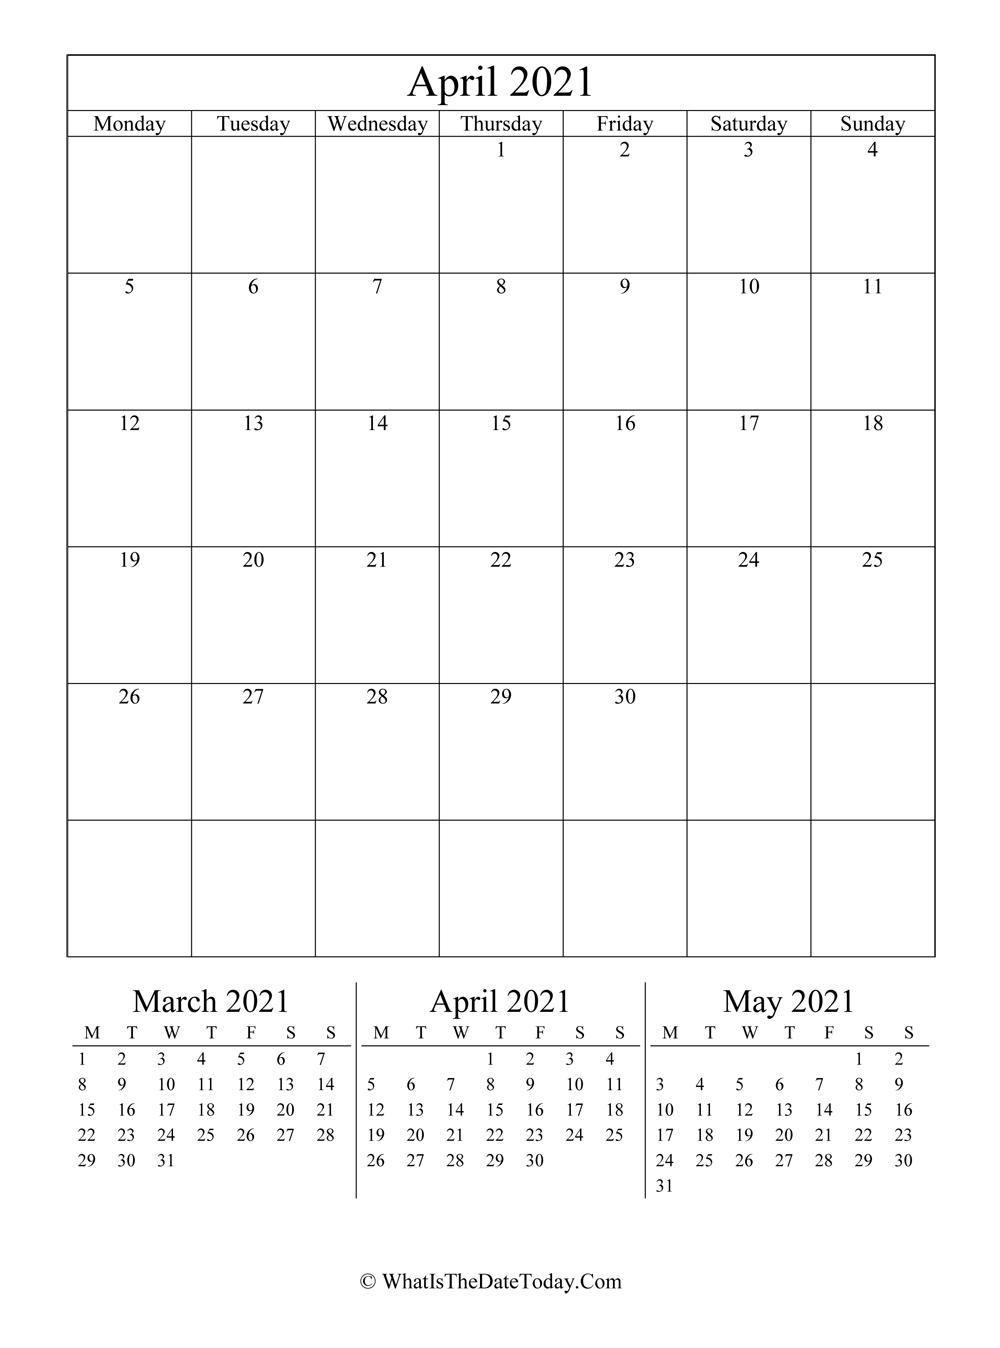 April 2021 Editable Calendar (Vertical Layout